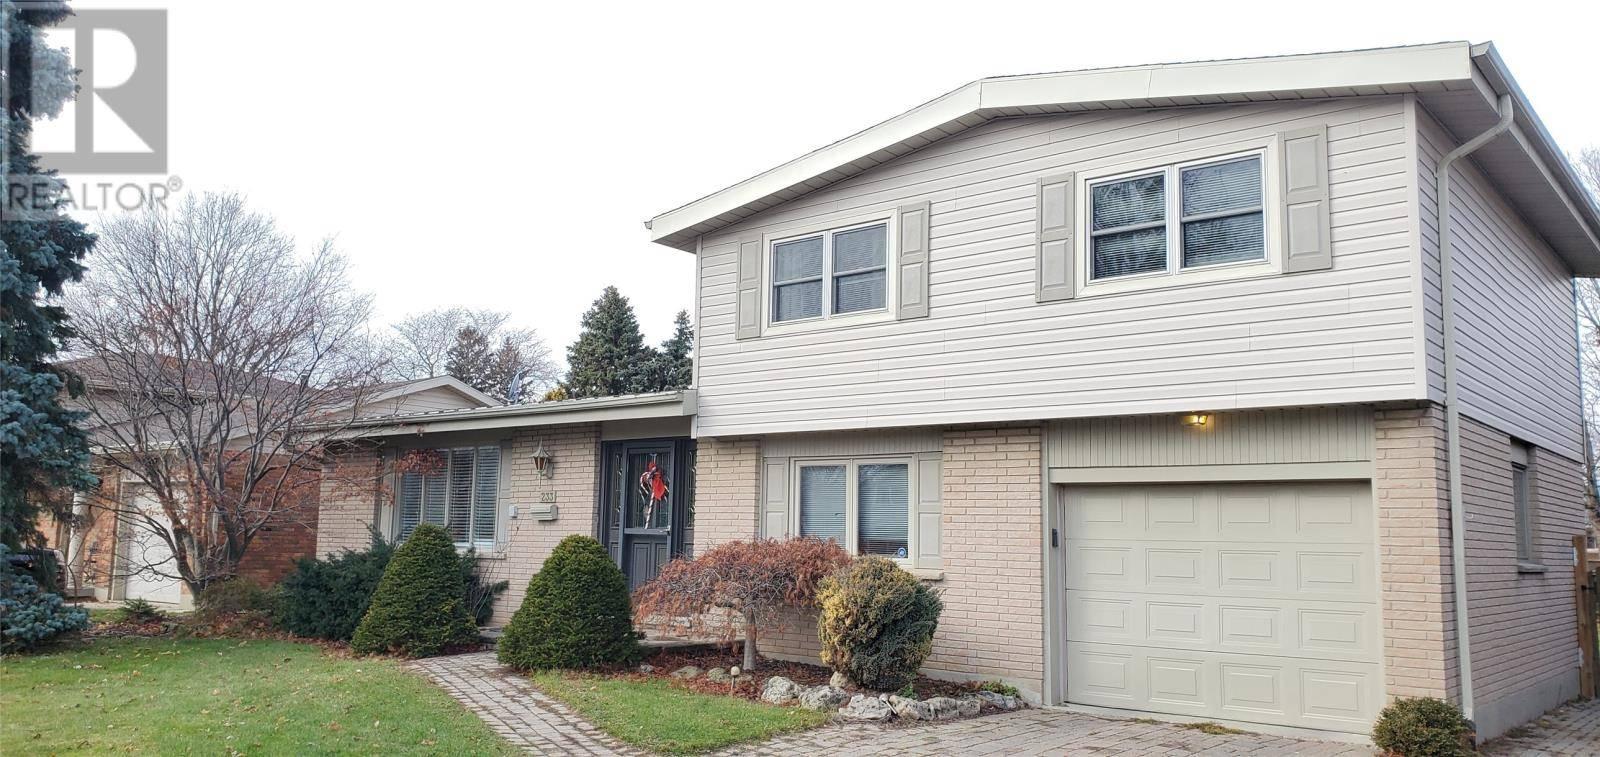 House for sale at 233 Tweedsmuir Ave West Chatham Ontario - MLS: 19028990